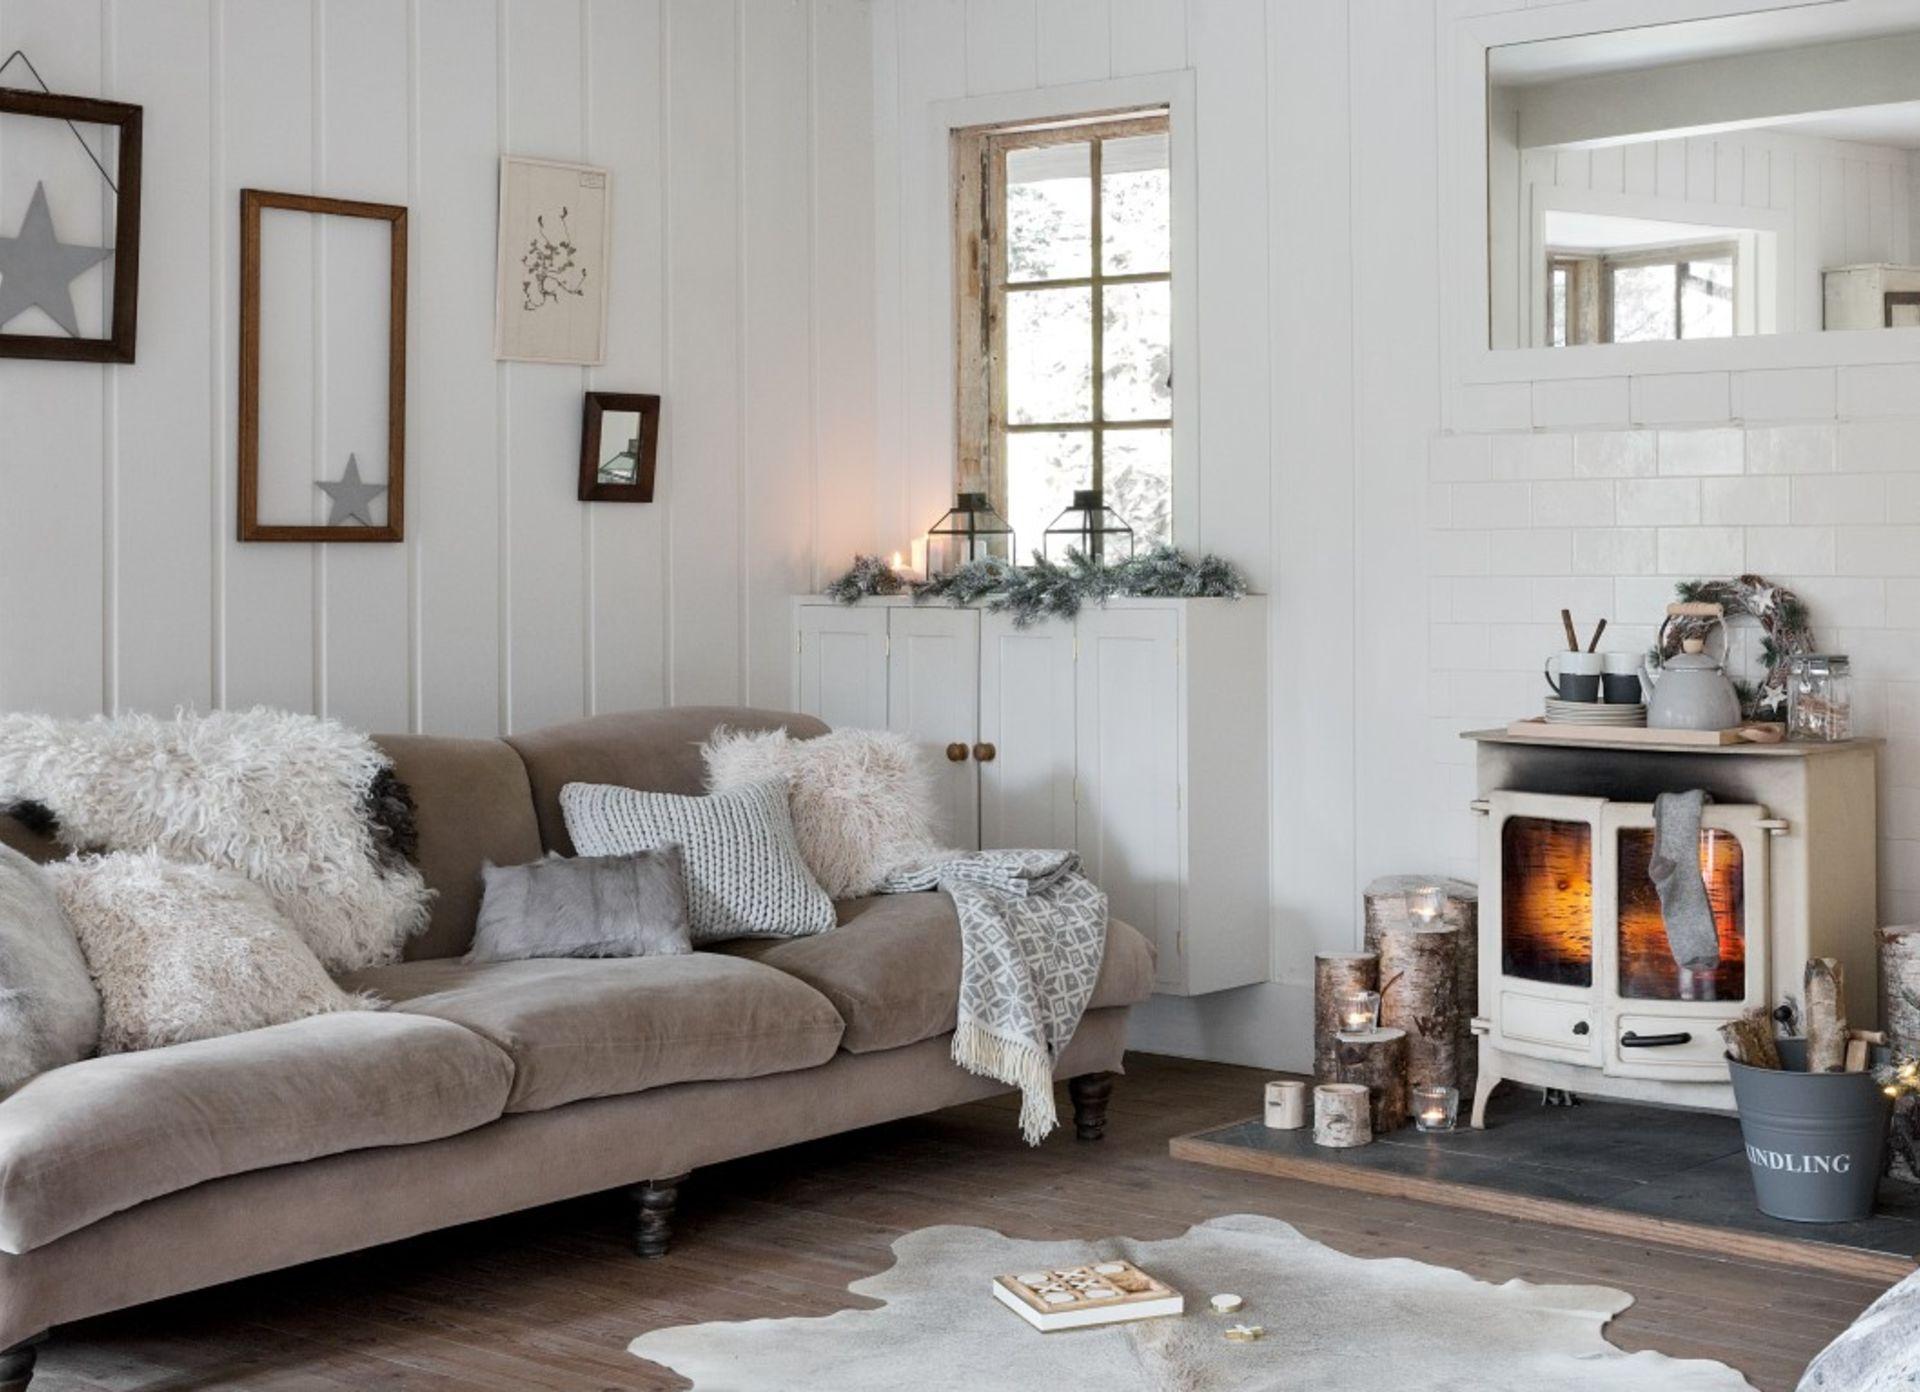 Get Hygge: Cozy Up to Scandinavian Simplicity